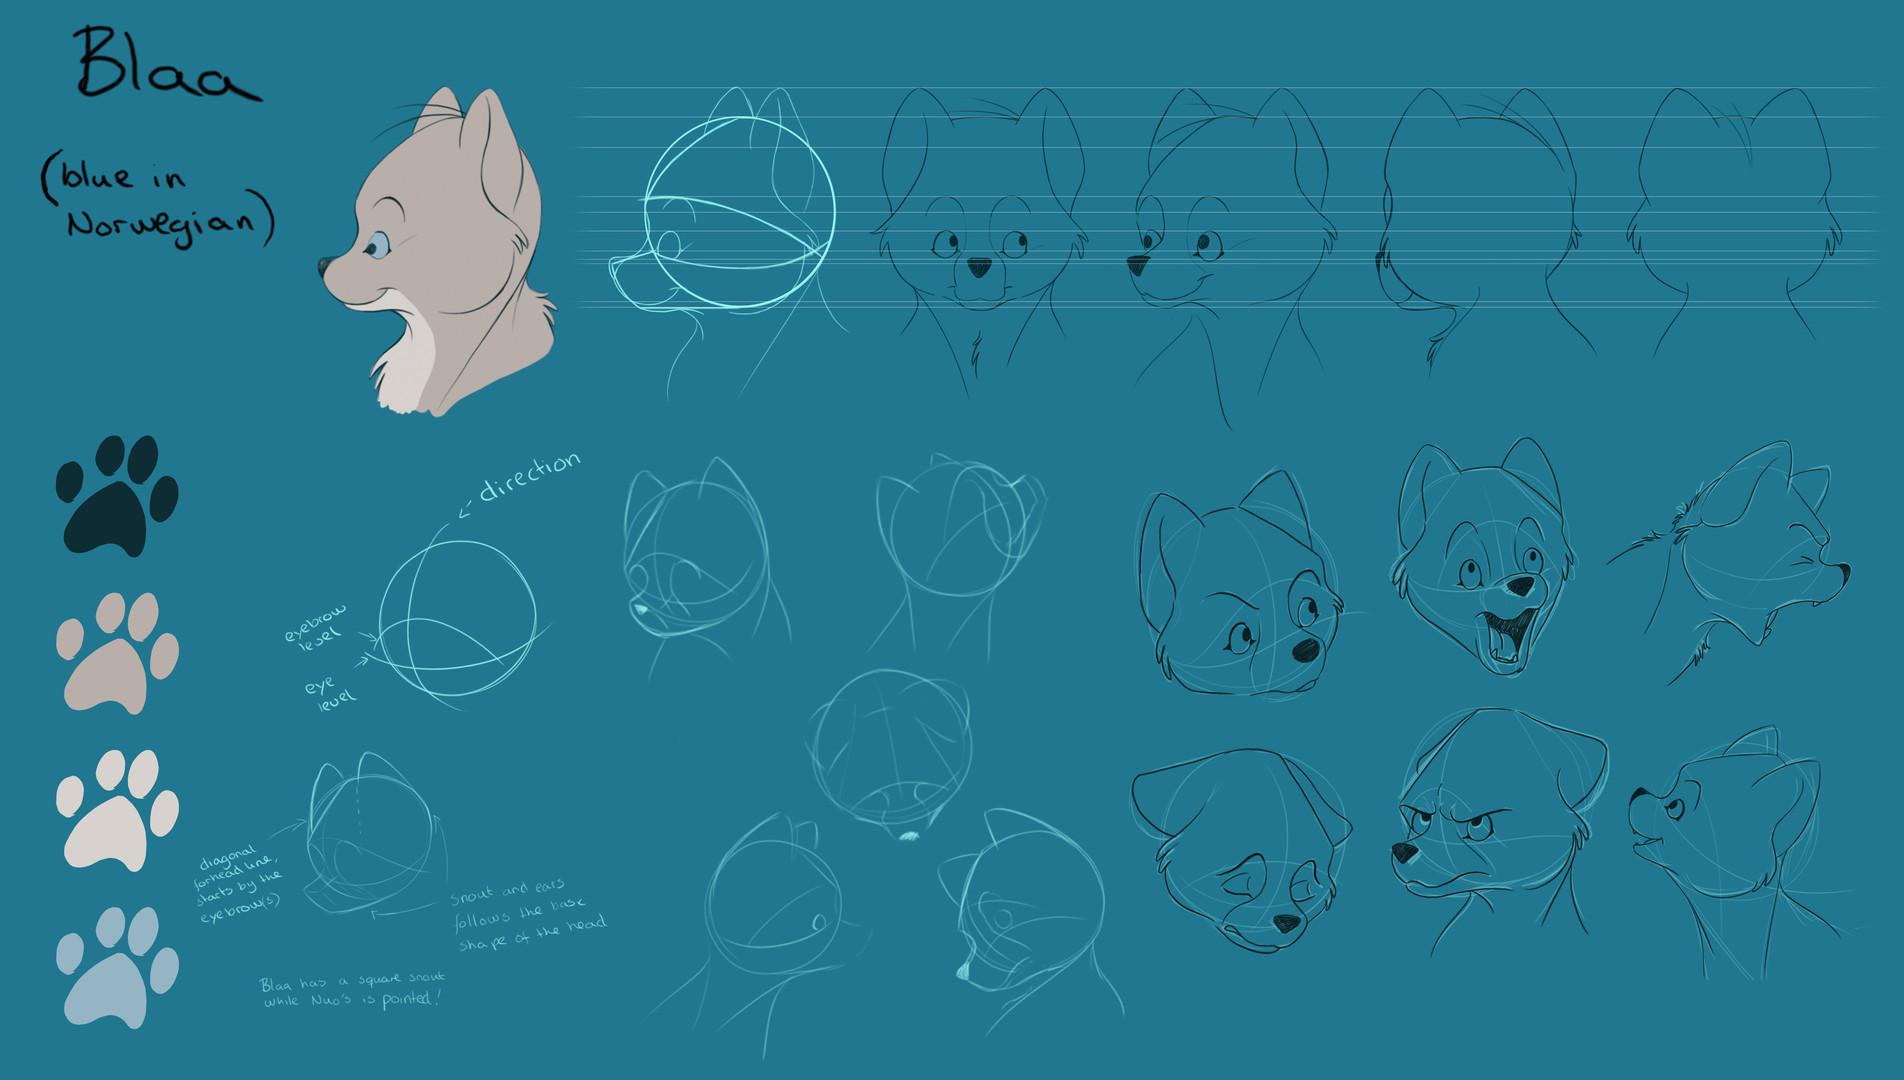 Fox cub character design. From graduation film, Leave a print, 2016